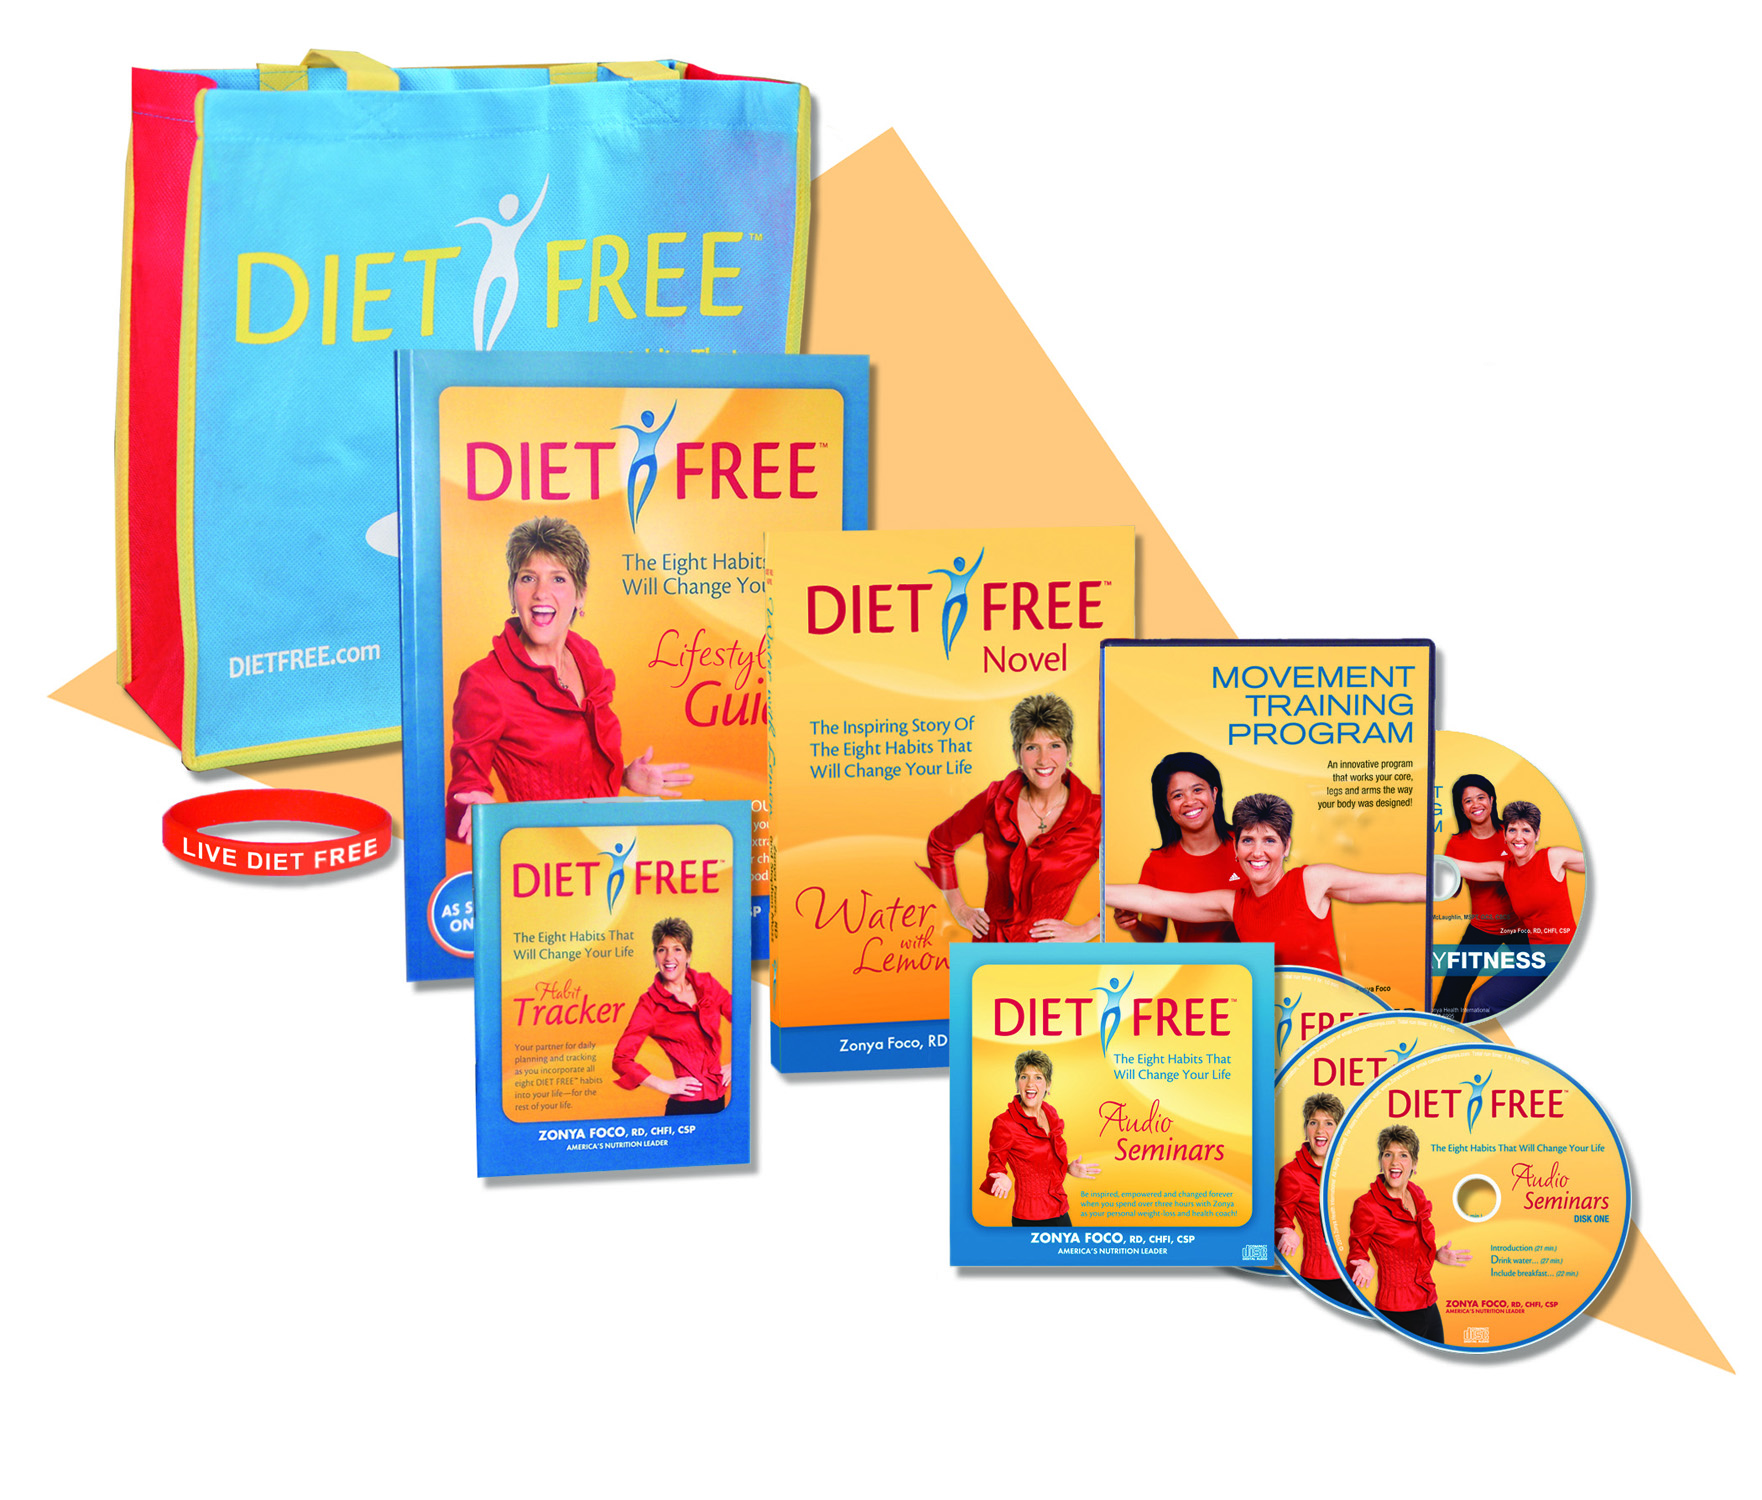 DIET FREE Worksite Wellness Program